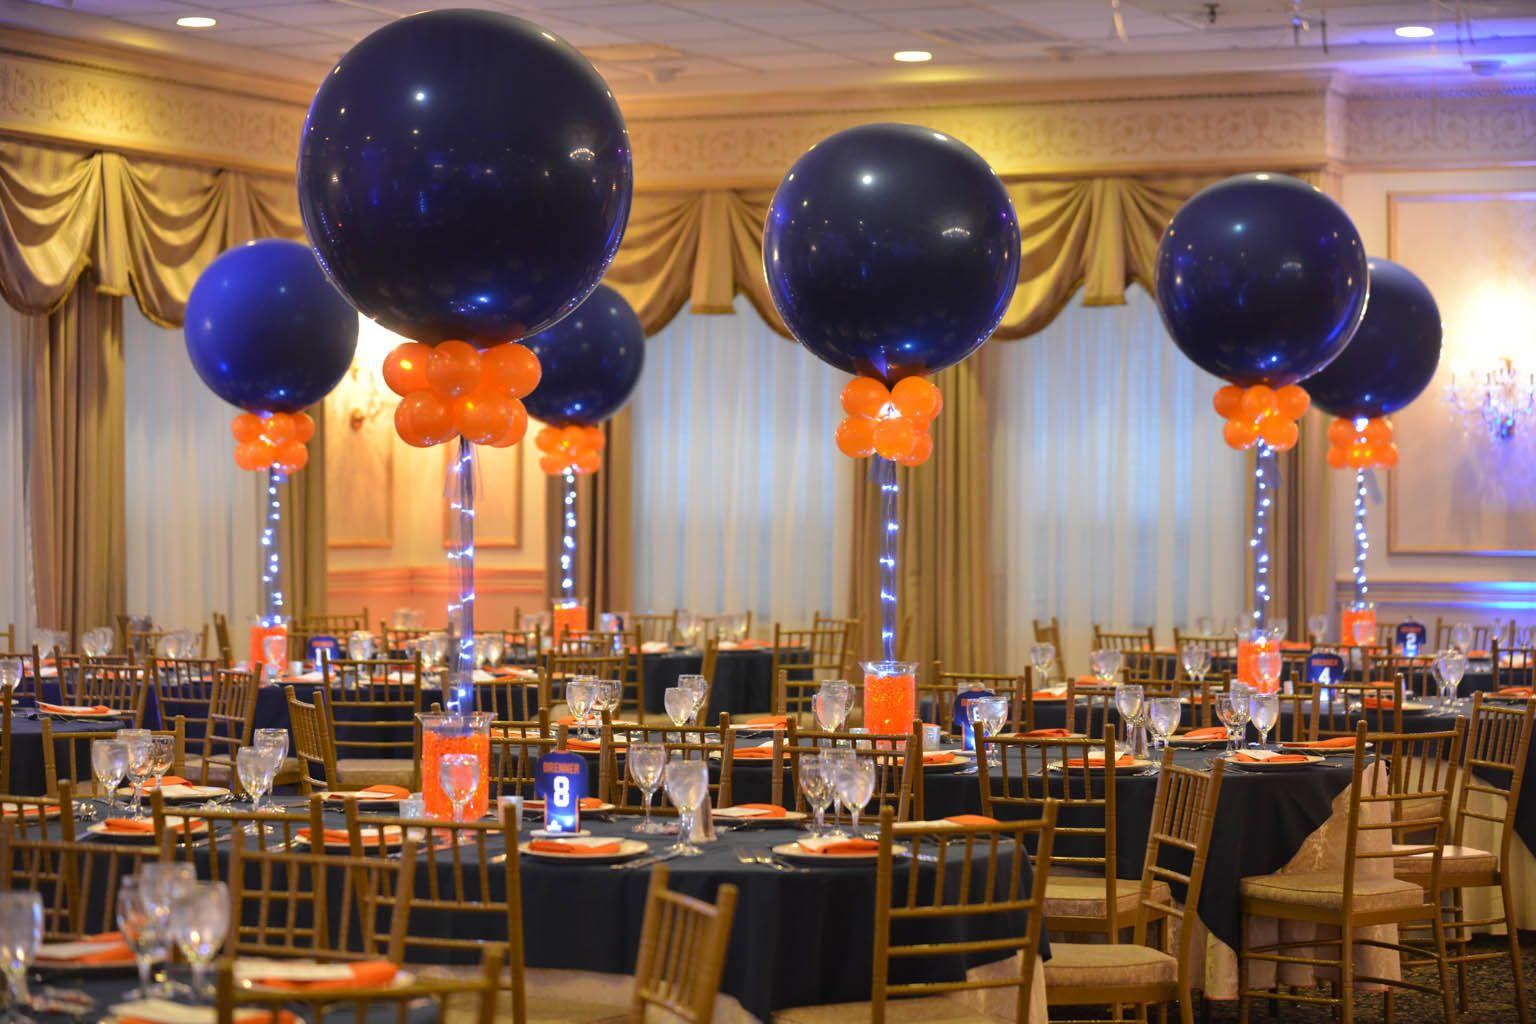 Aqua Gems Centerpieces · Party & Event Decor | Parties ...